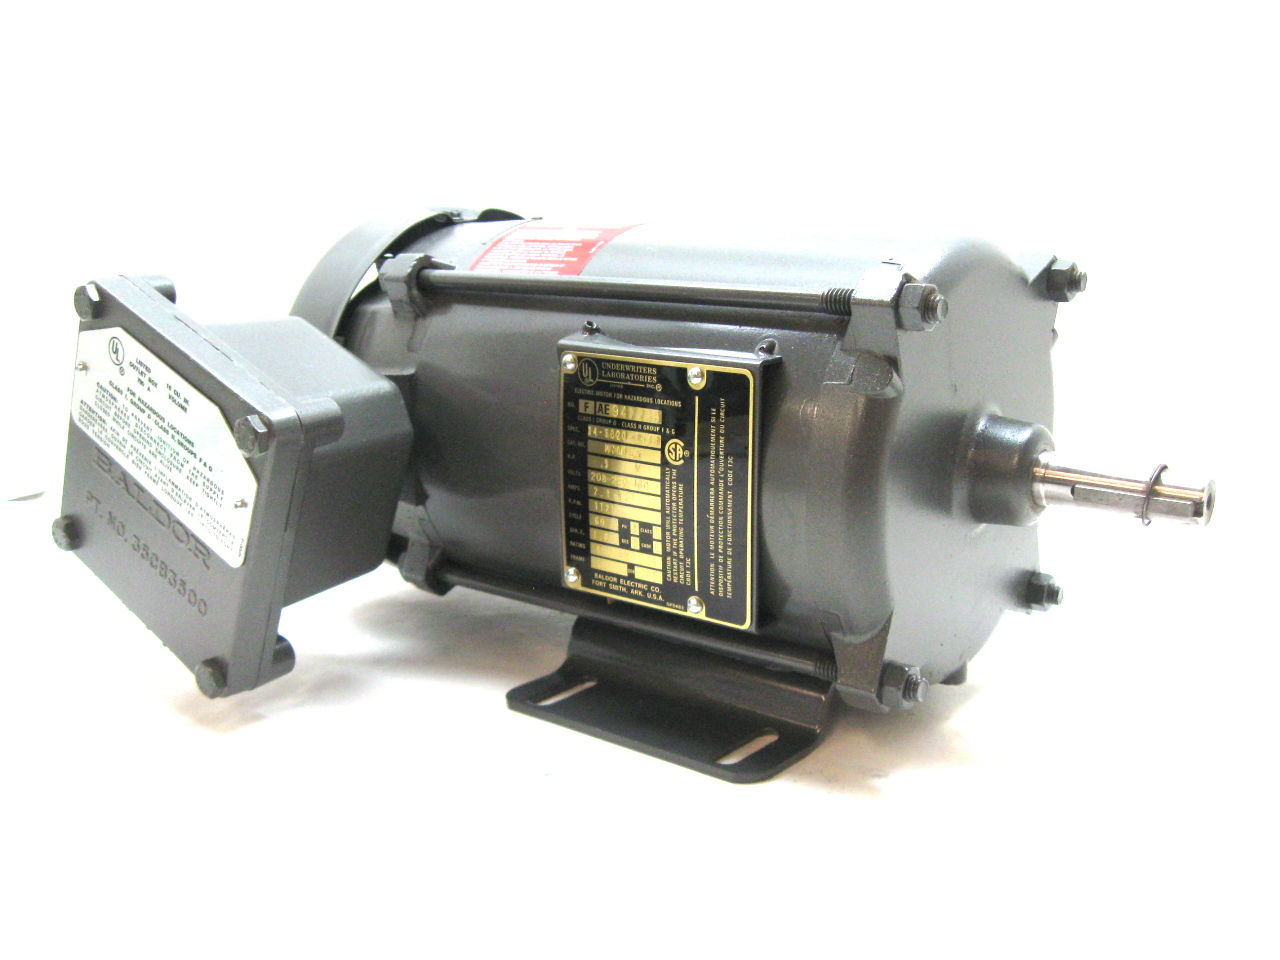 Baldor M7006a Motor 5 Hp 208 230 460 V 1725 Rpm 3 Phase